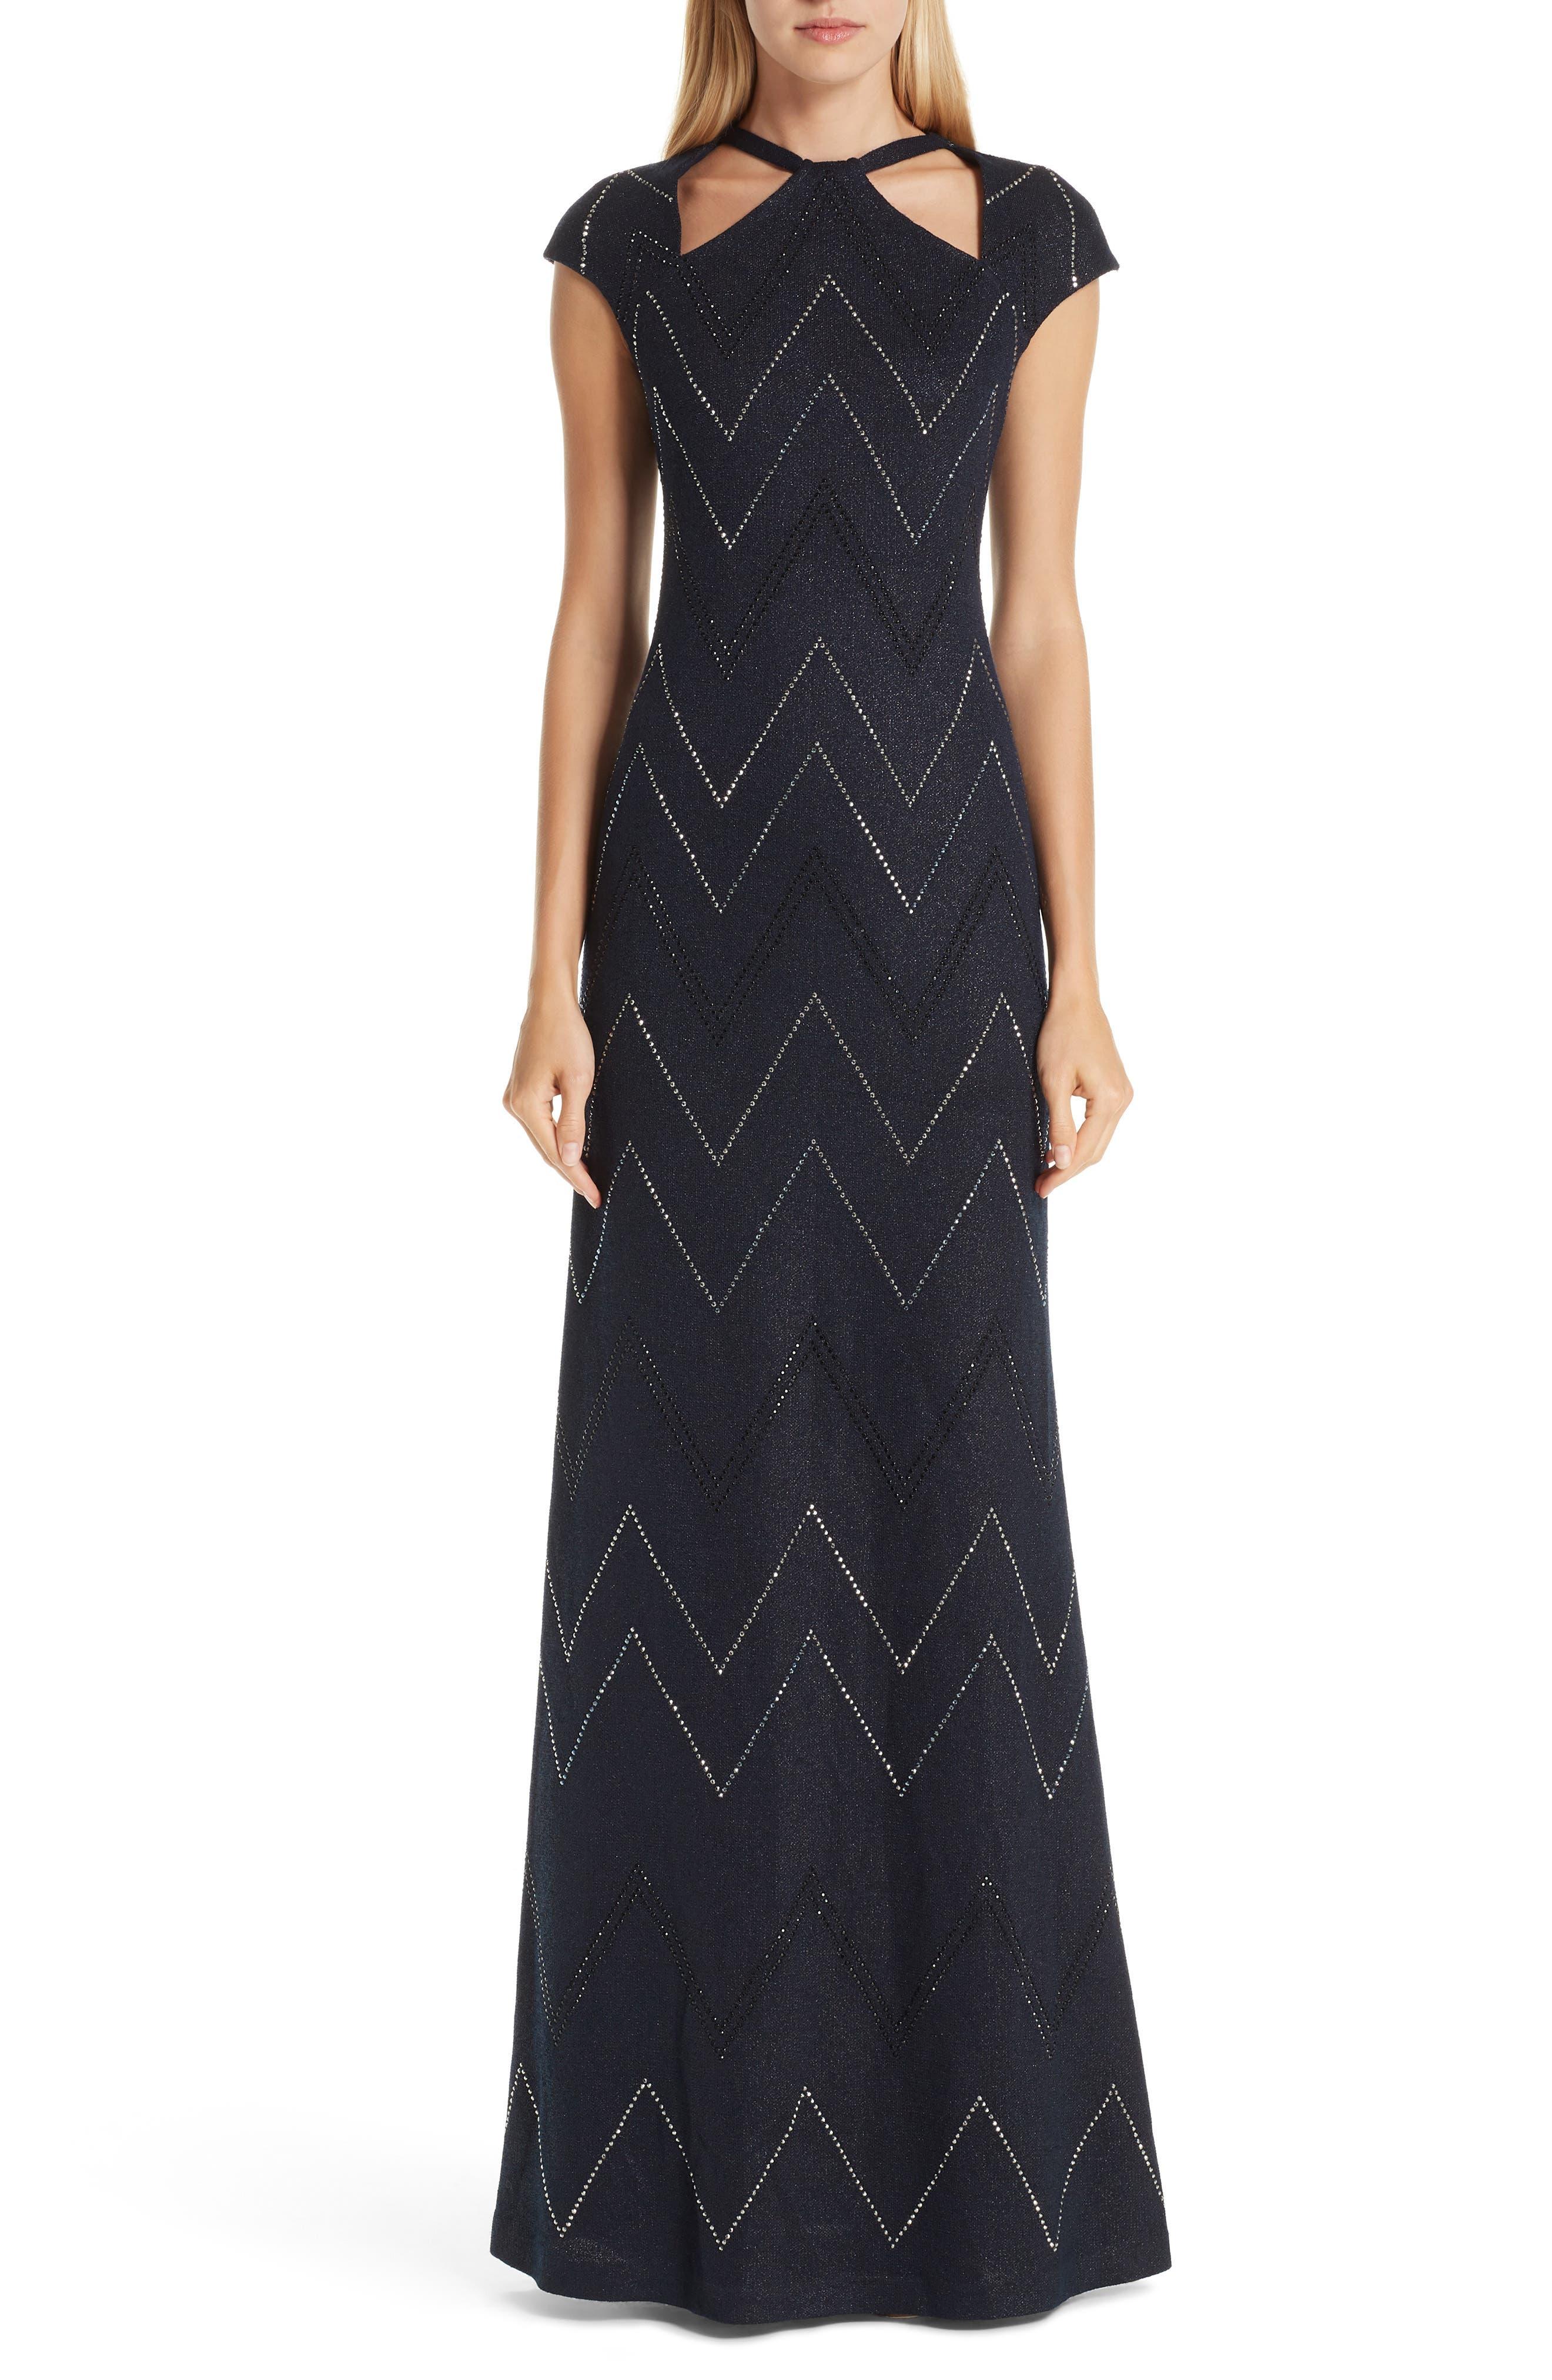 St. John Collection Mod Metallic Knit Gown